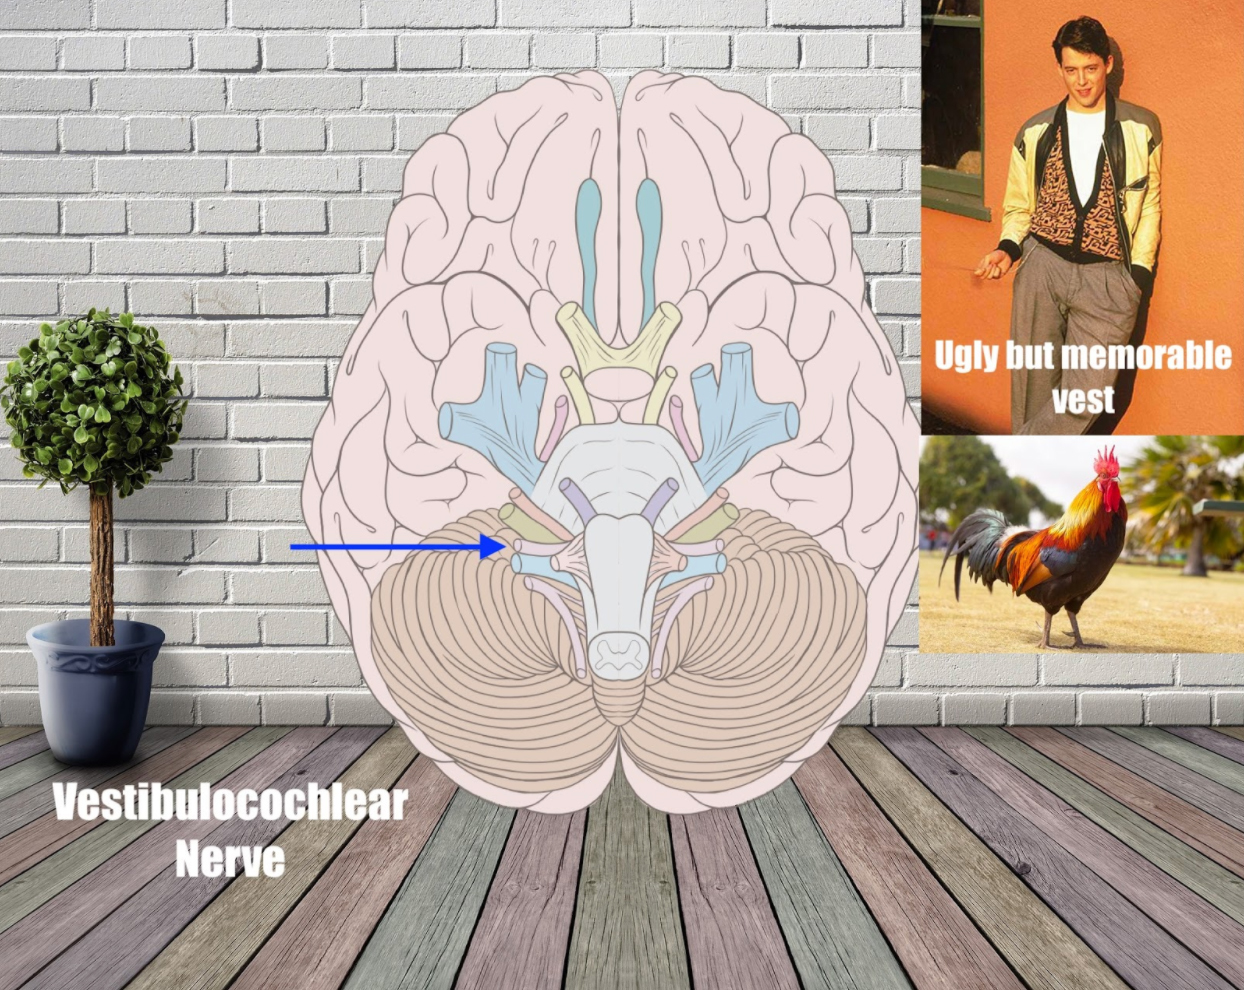 vestibulocochlear nerve mnemonic example